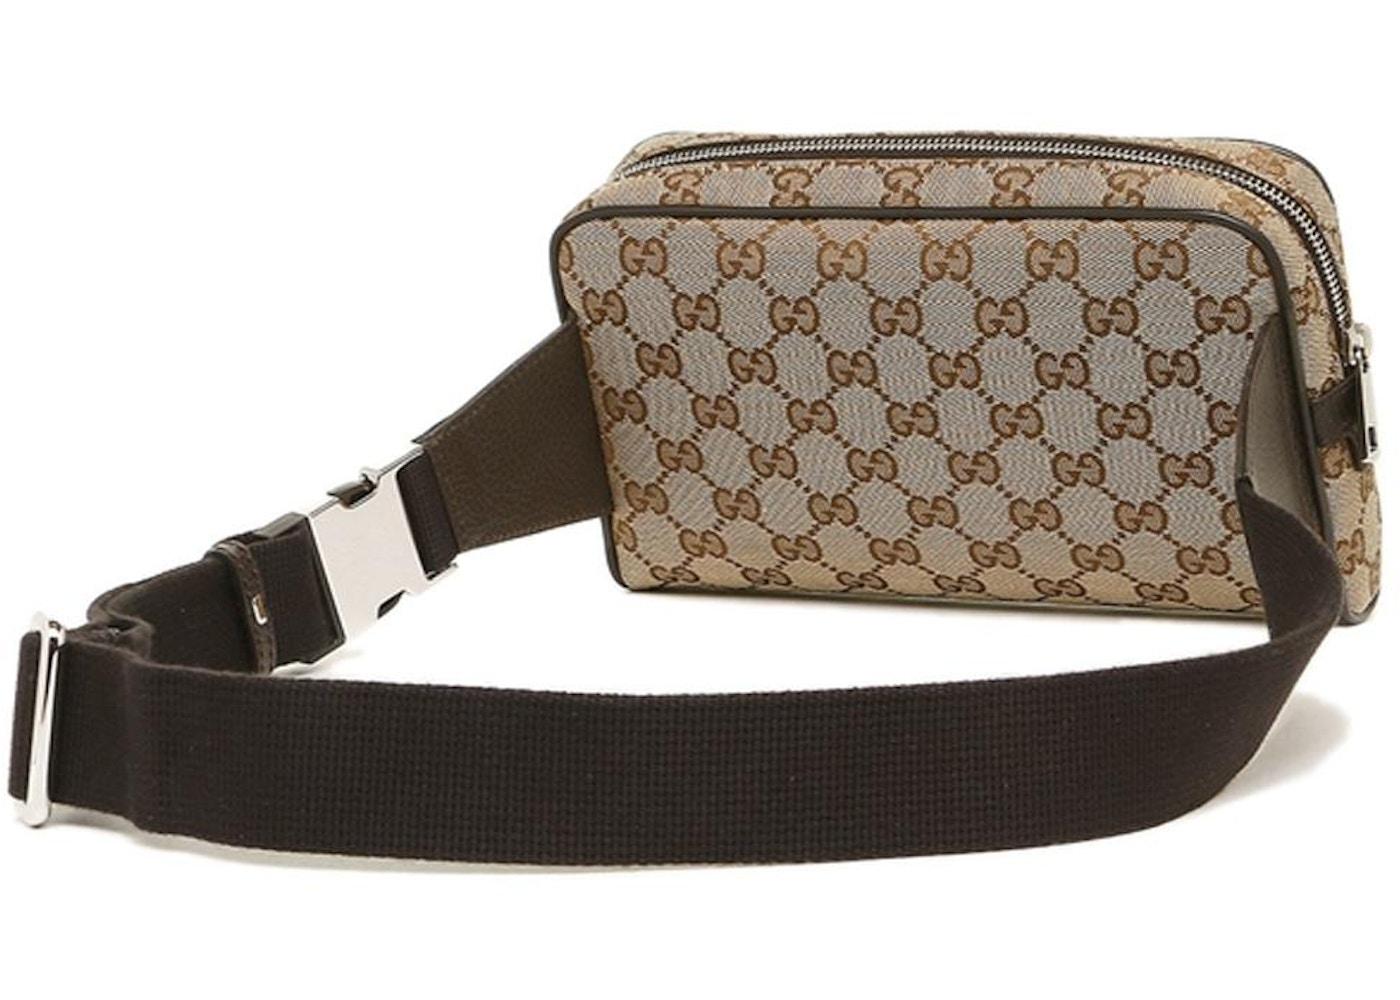 e443a244ed5 Buy   Sell Gucci Luxury Handbags